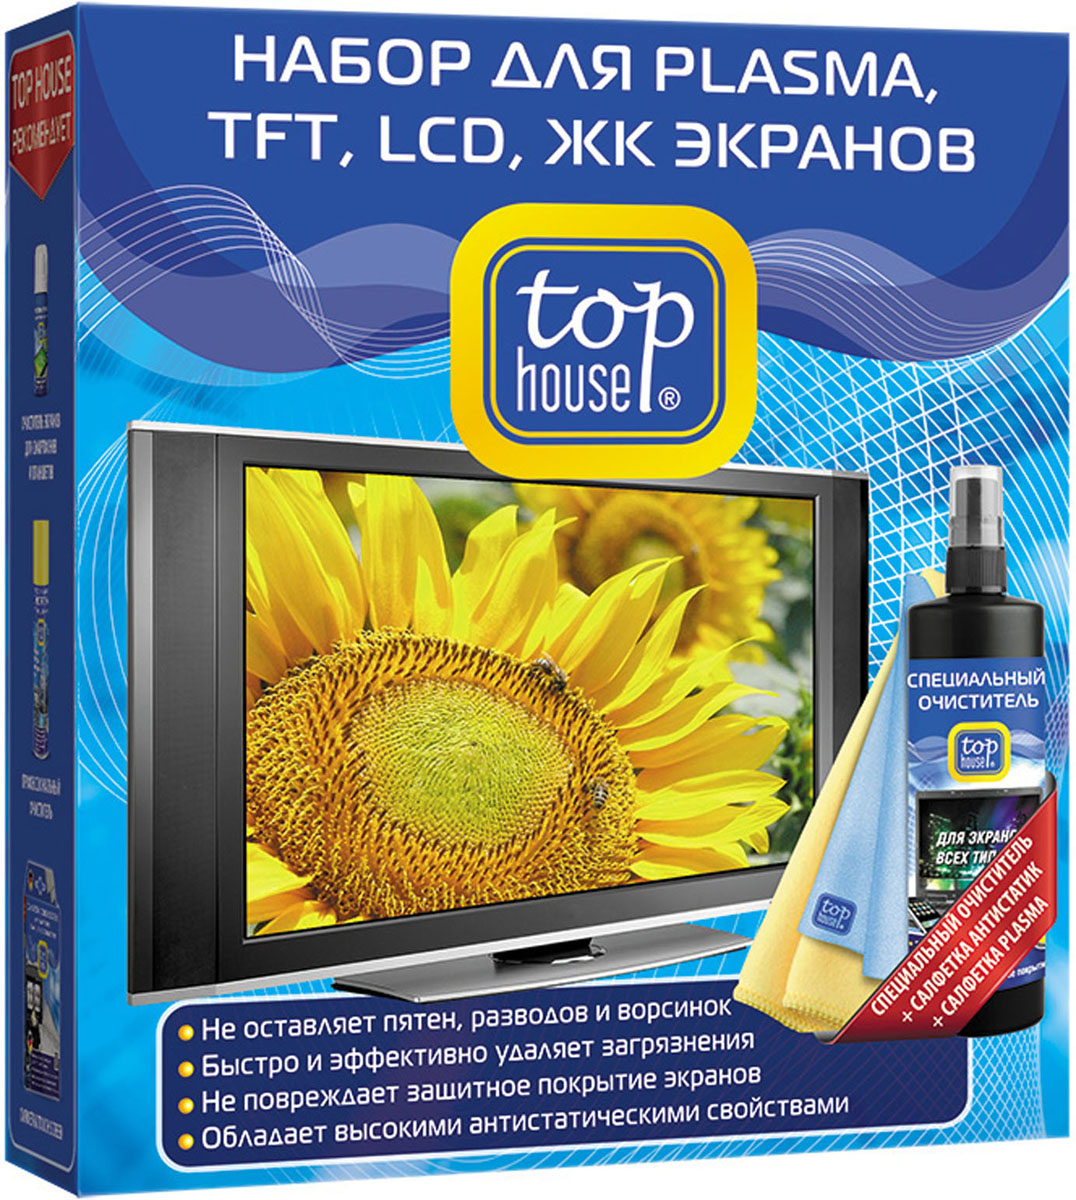 Набор для ухода за Plasma, TFT, LCD, ЖК экранами